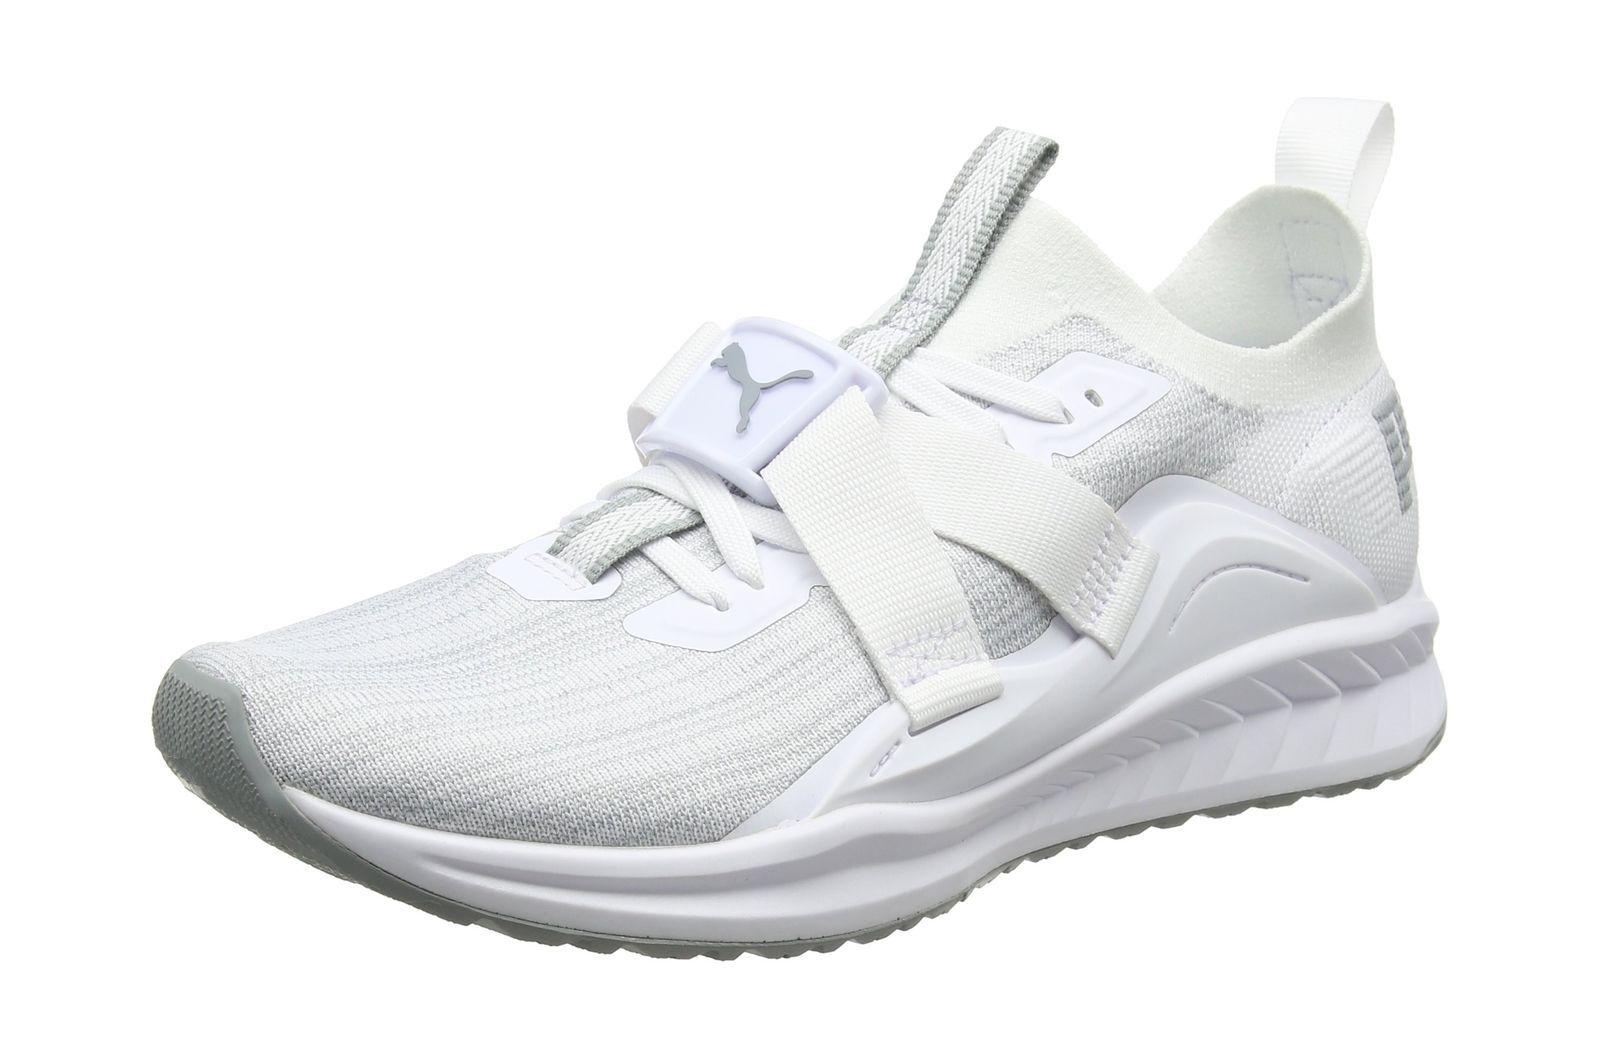 Mens Ignite Evoknit Lo 2 Cross Trainers, White/Grey Puma